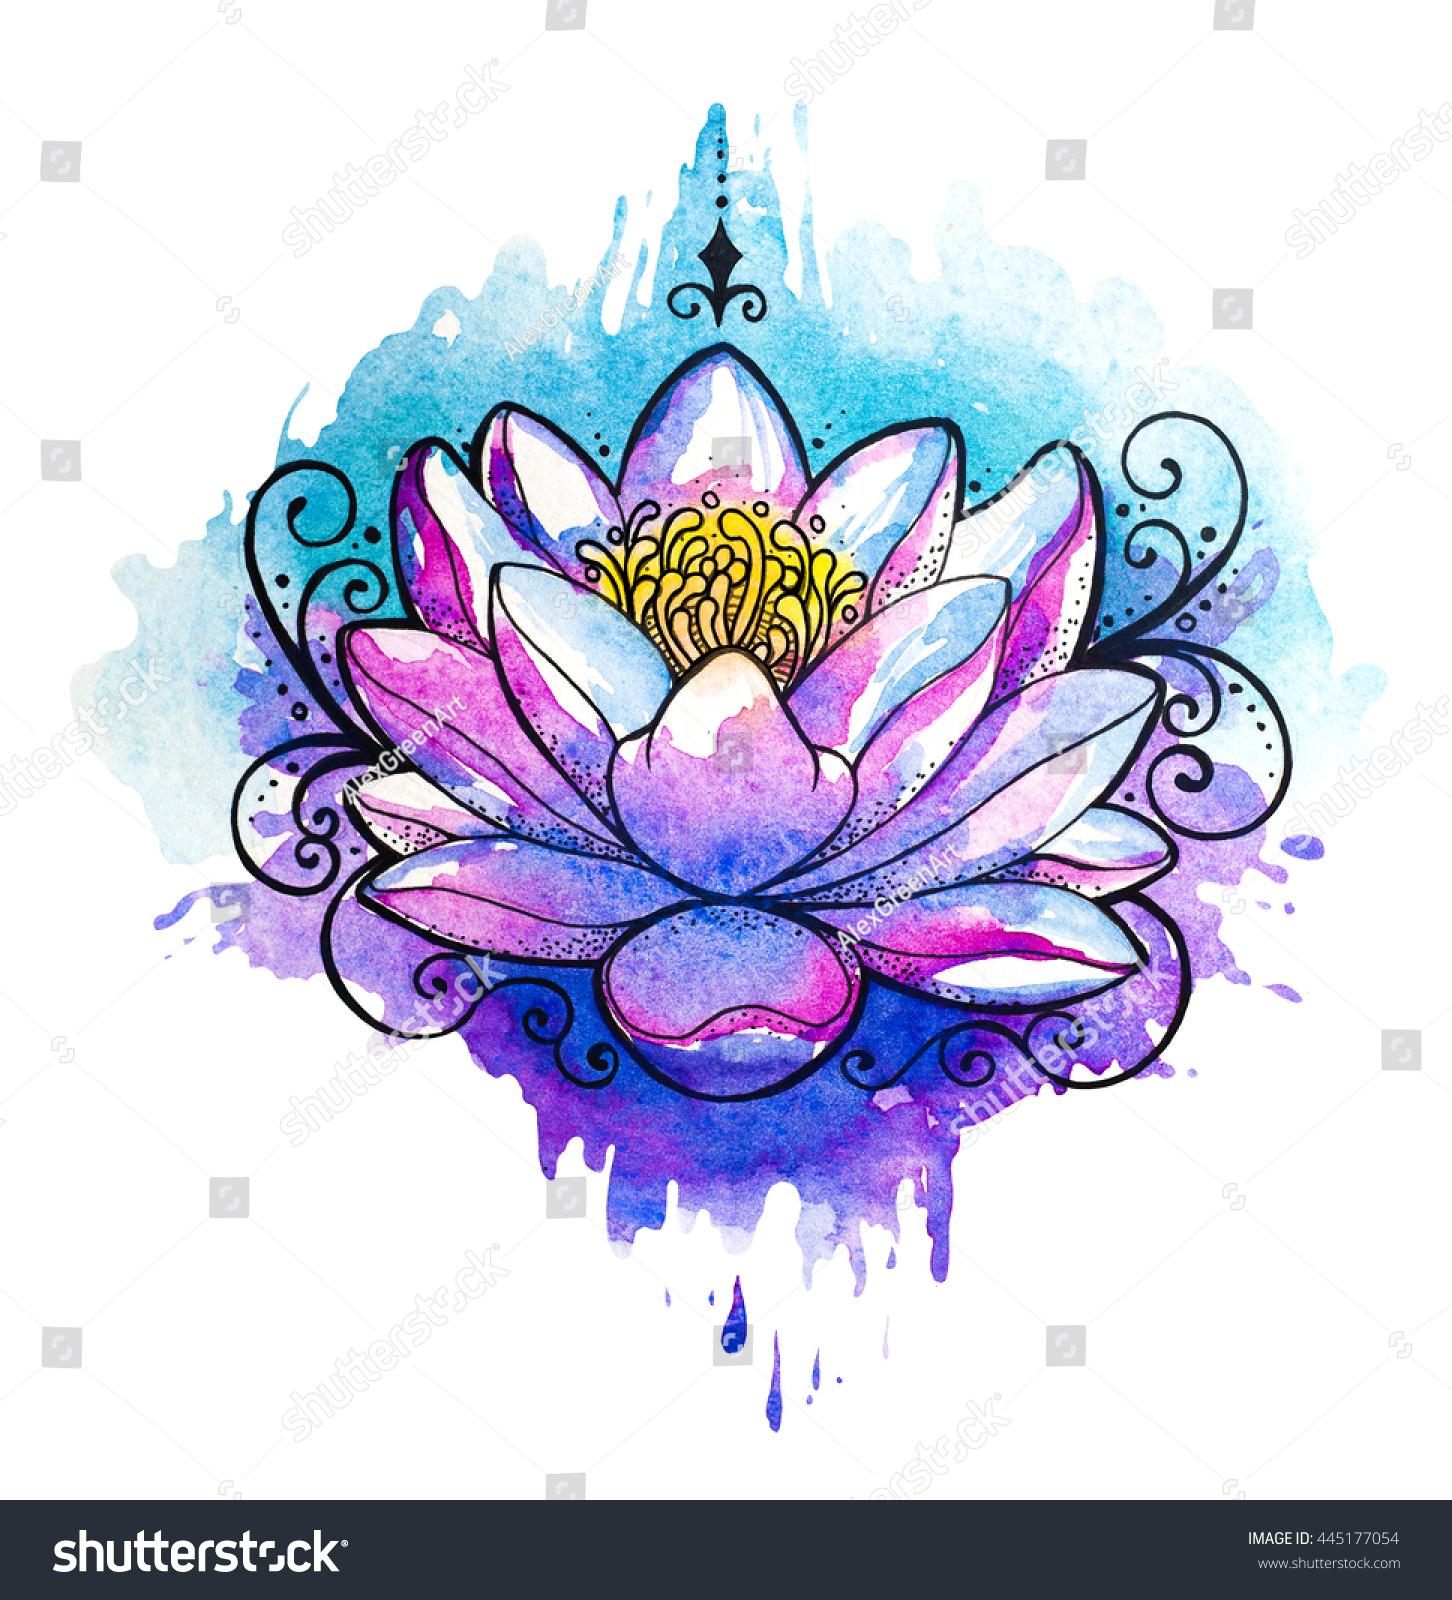 Watercolor Yin Yang Simbol Watercolor Tattoo Stock Illustration ...